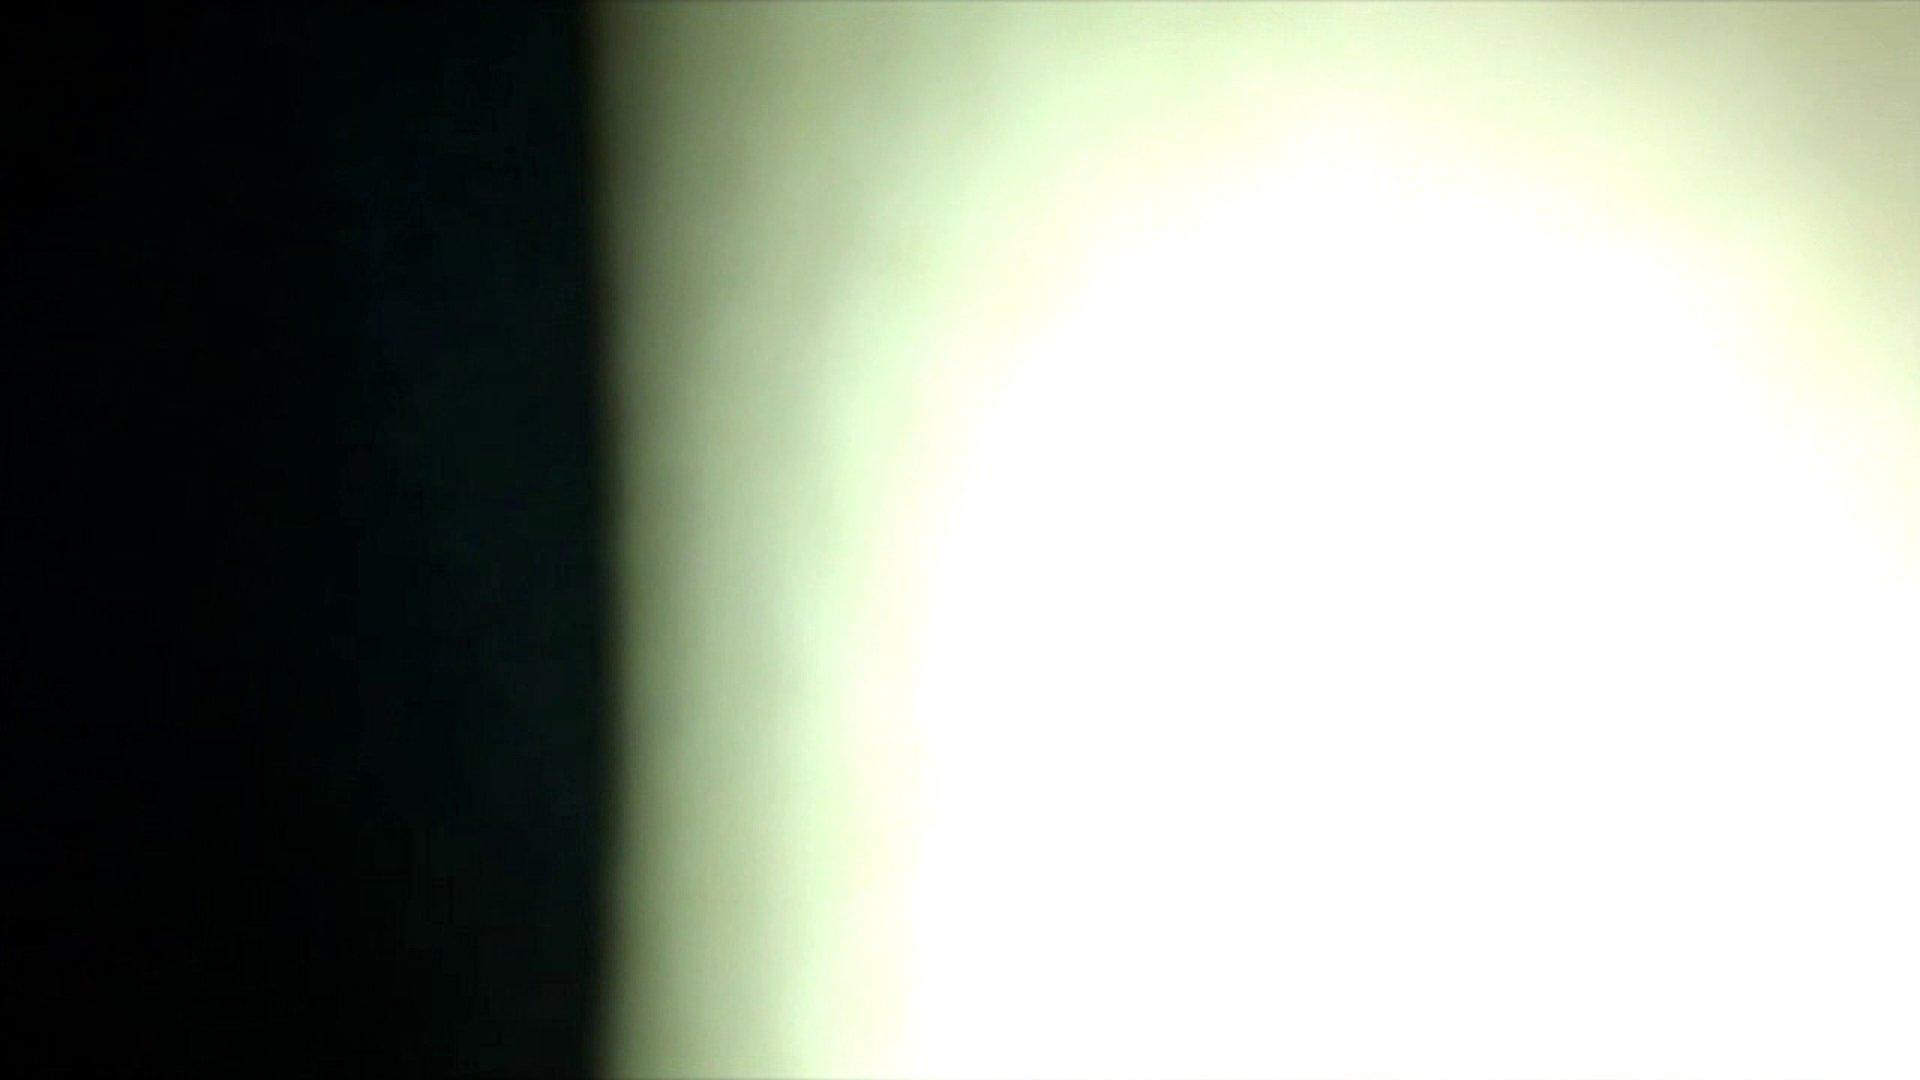 vol.22 【YHちゃん】パルコ店員20歳 mixiオフ会で イタズラ オメコ動画キャプチャ 64連発 5